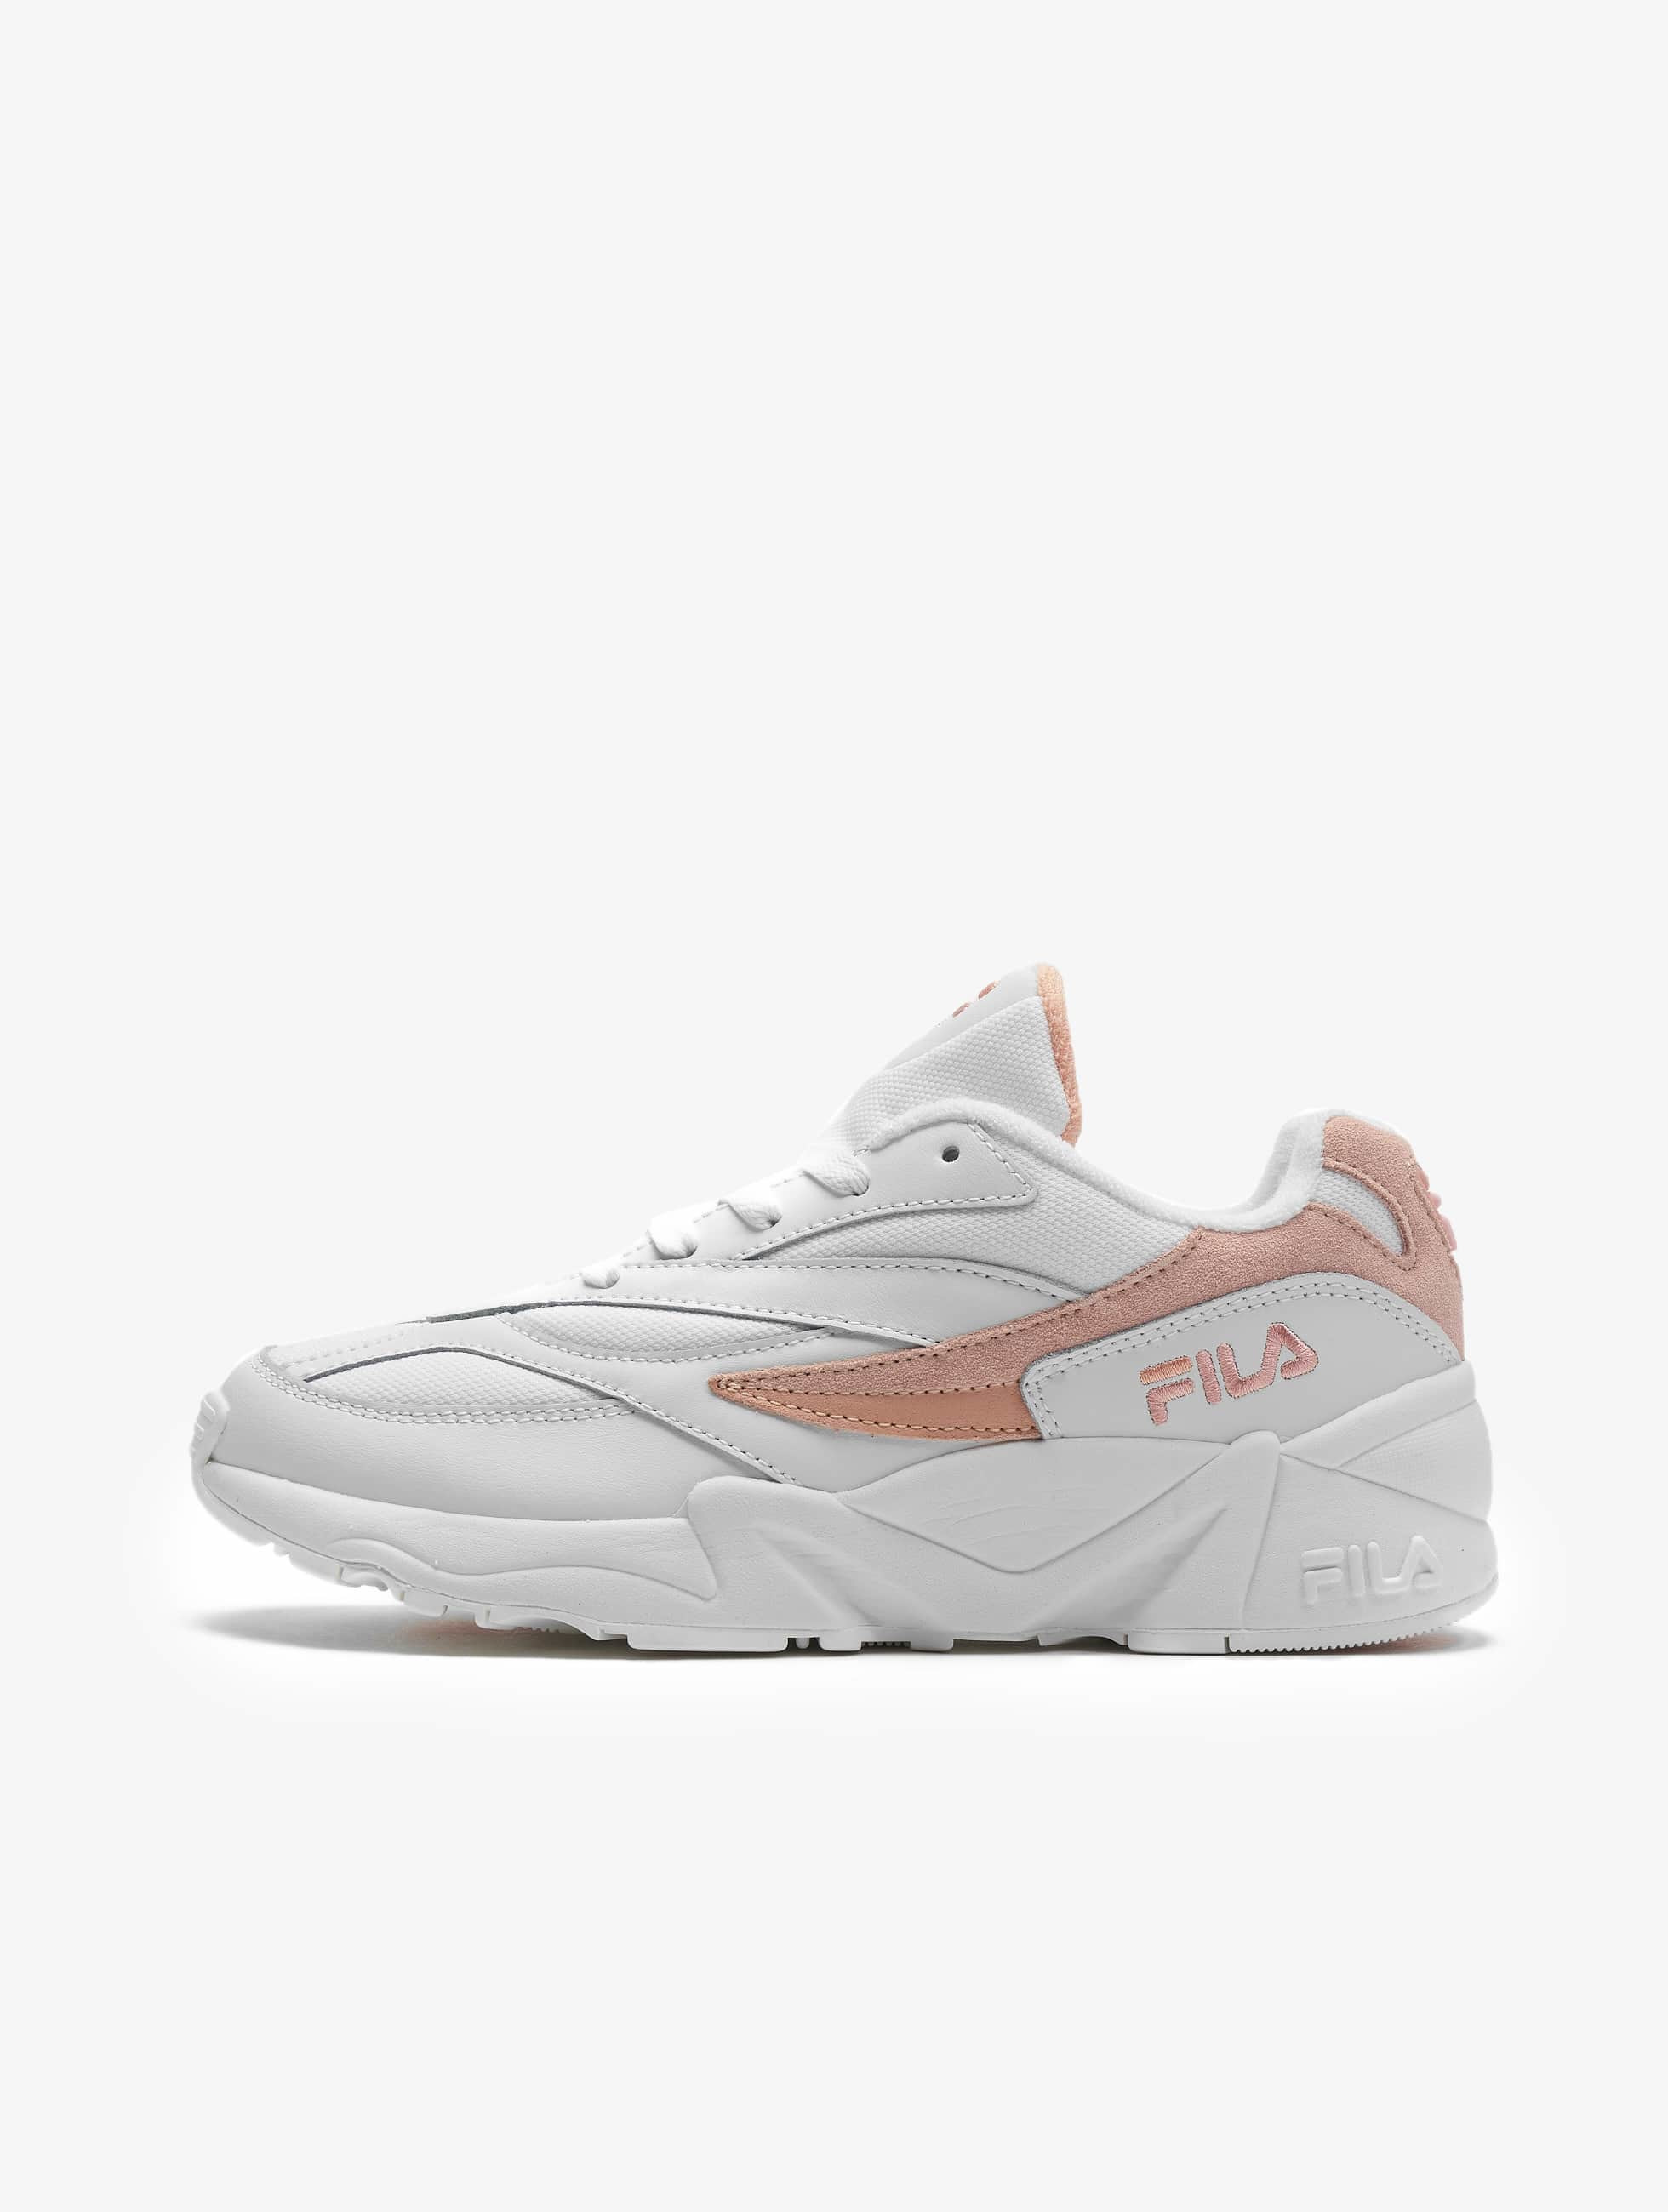 Fila Heritage V94M Low Sneakers WhiteSalmonChalk Pink